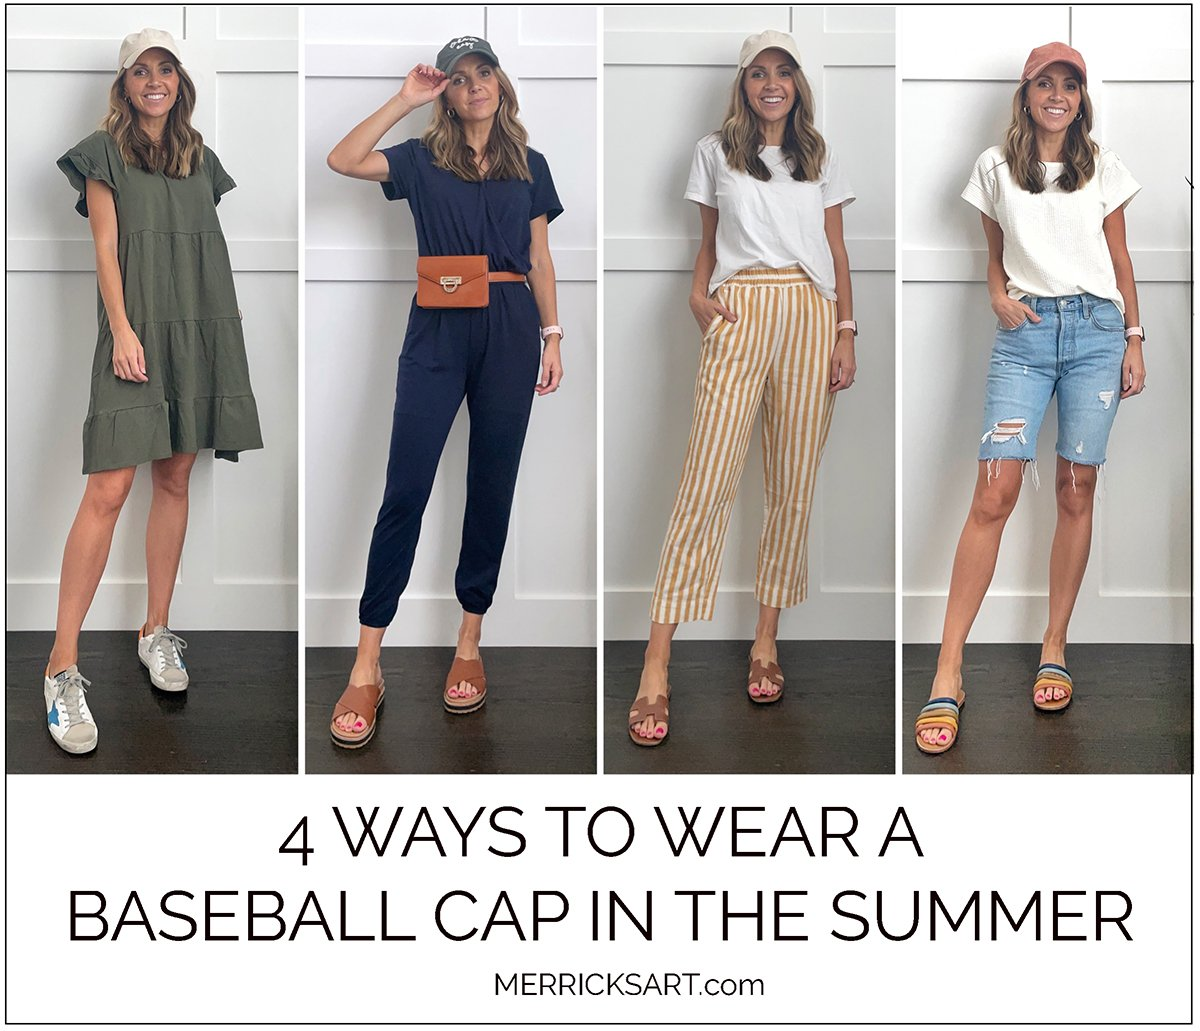 4 ways to wear a baseball hat